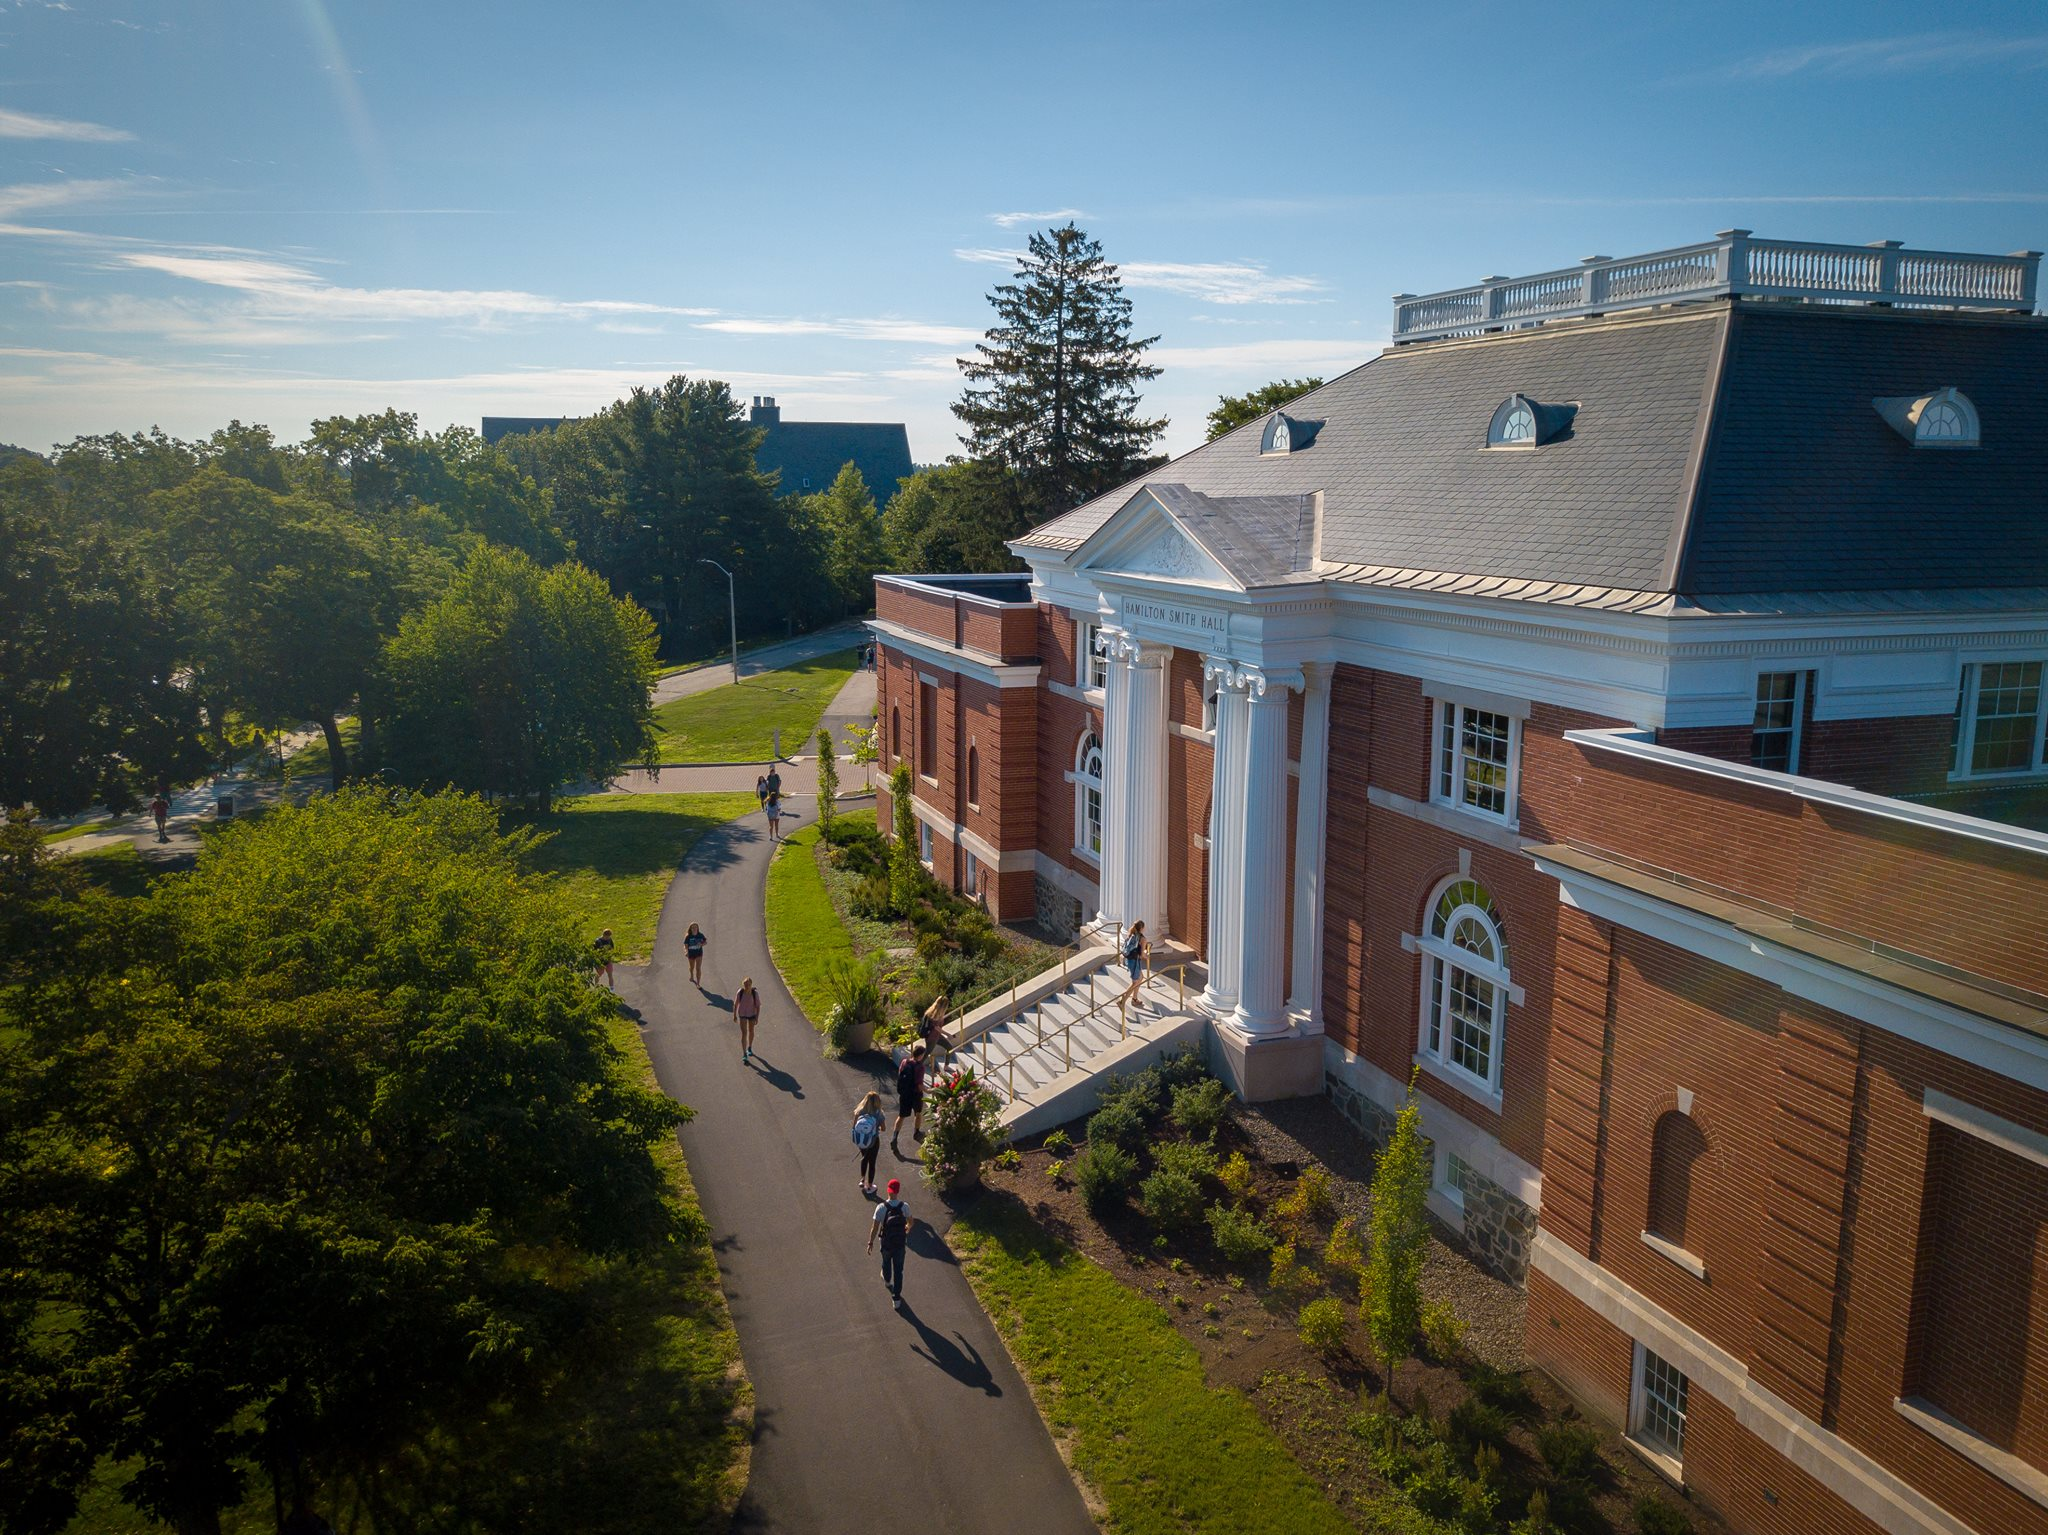 University of New Hampshire -